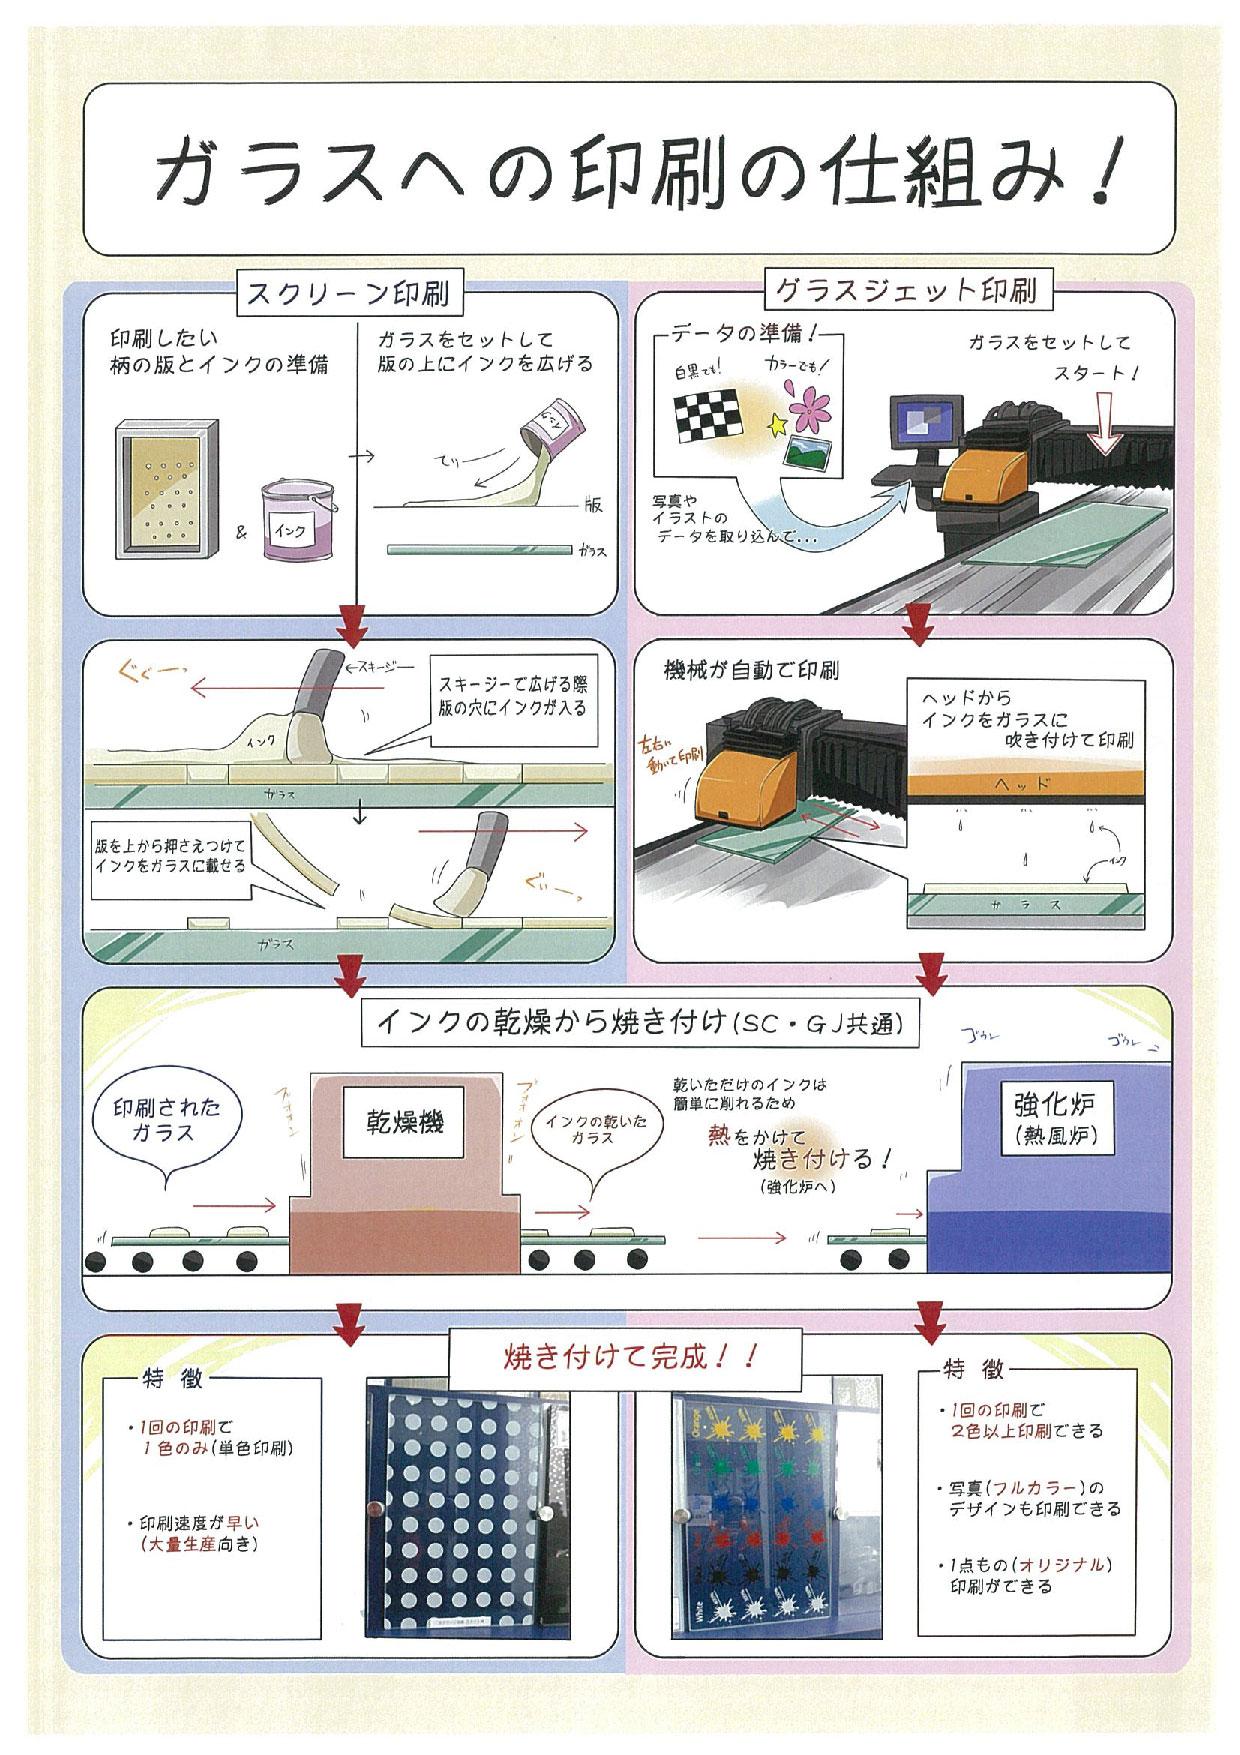 https://www.sanshiba-g.co.jp/images/setubi/PrintGlass.jpg